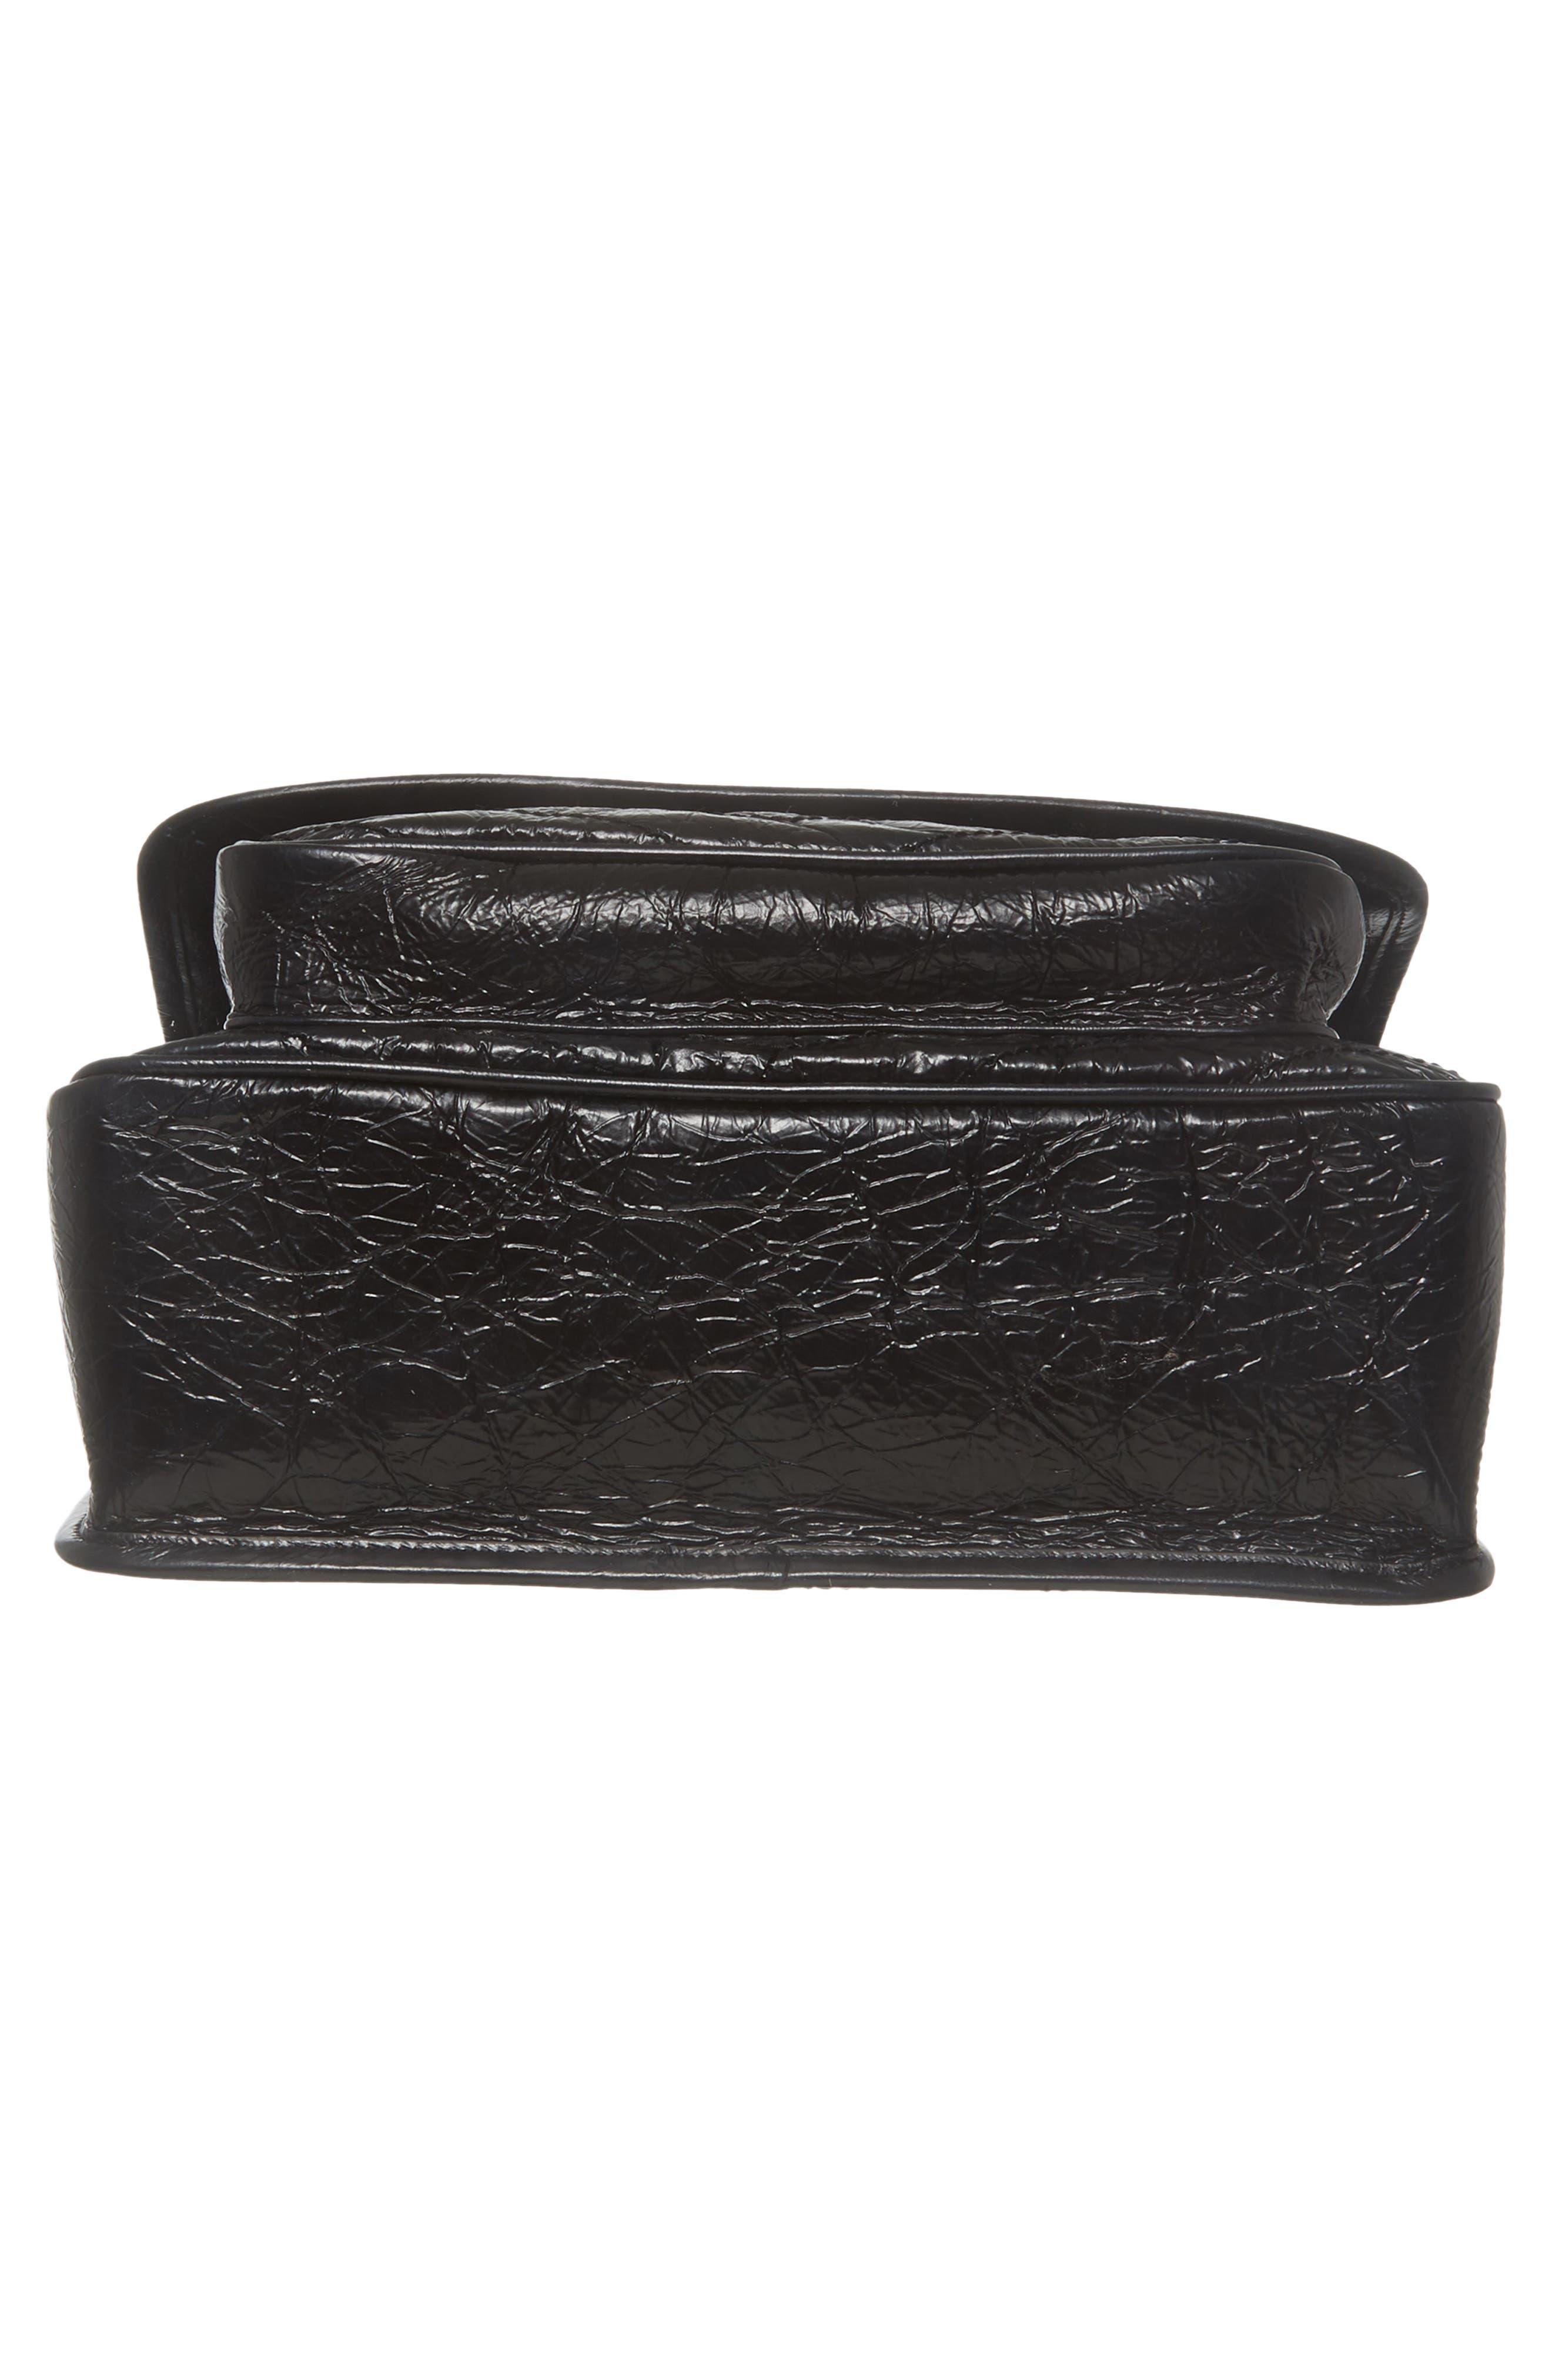 Medium Niki Leather Shoulder Bag,                             Alternate thumbnail 6, color,                             BLACK